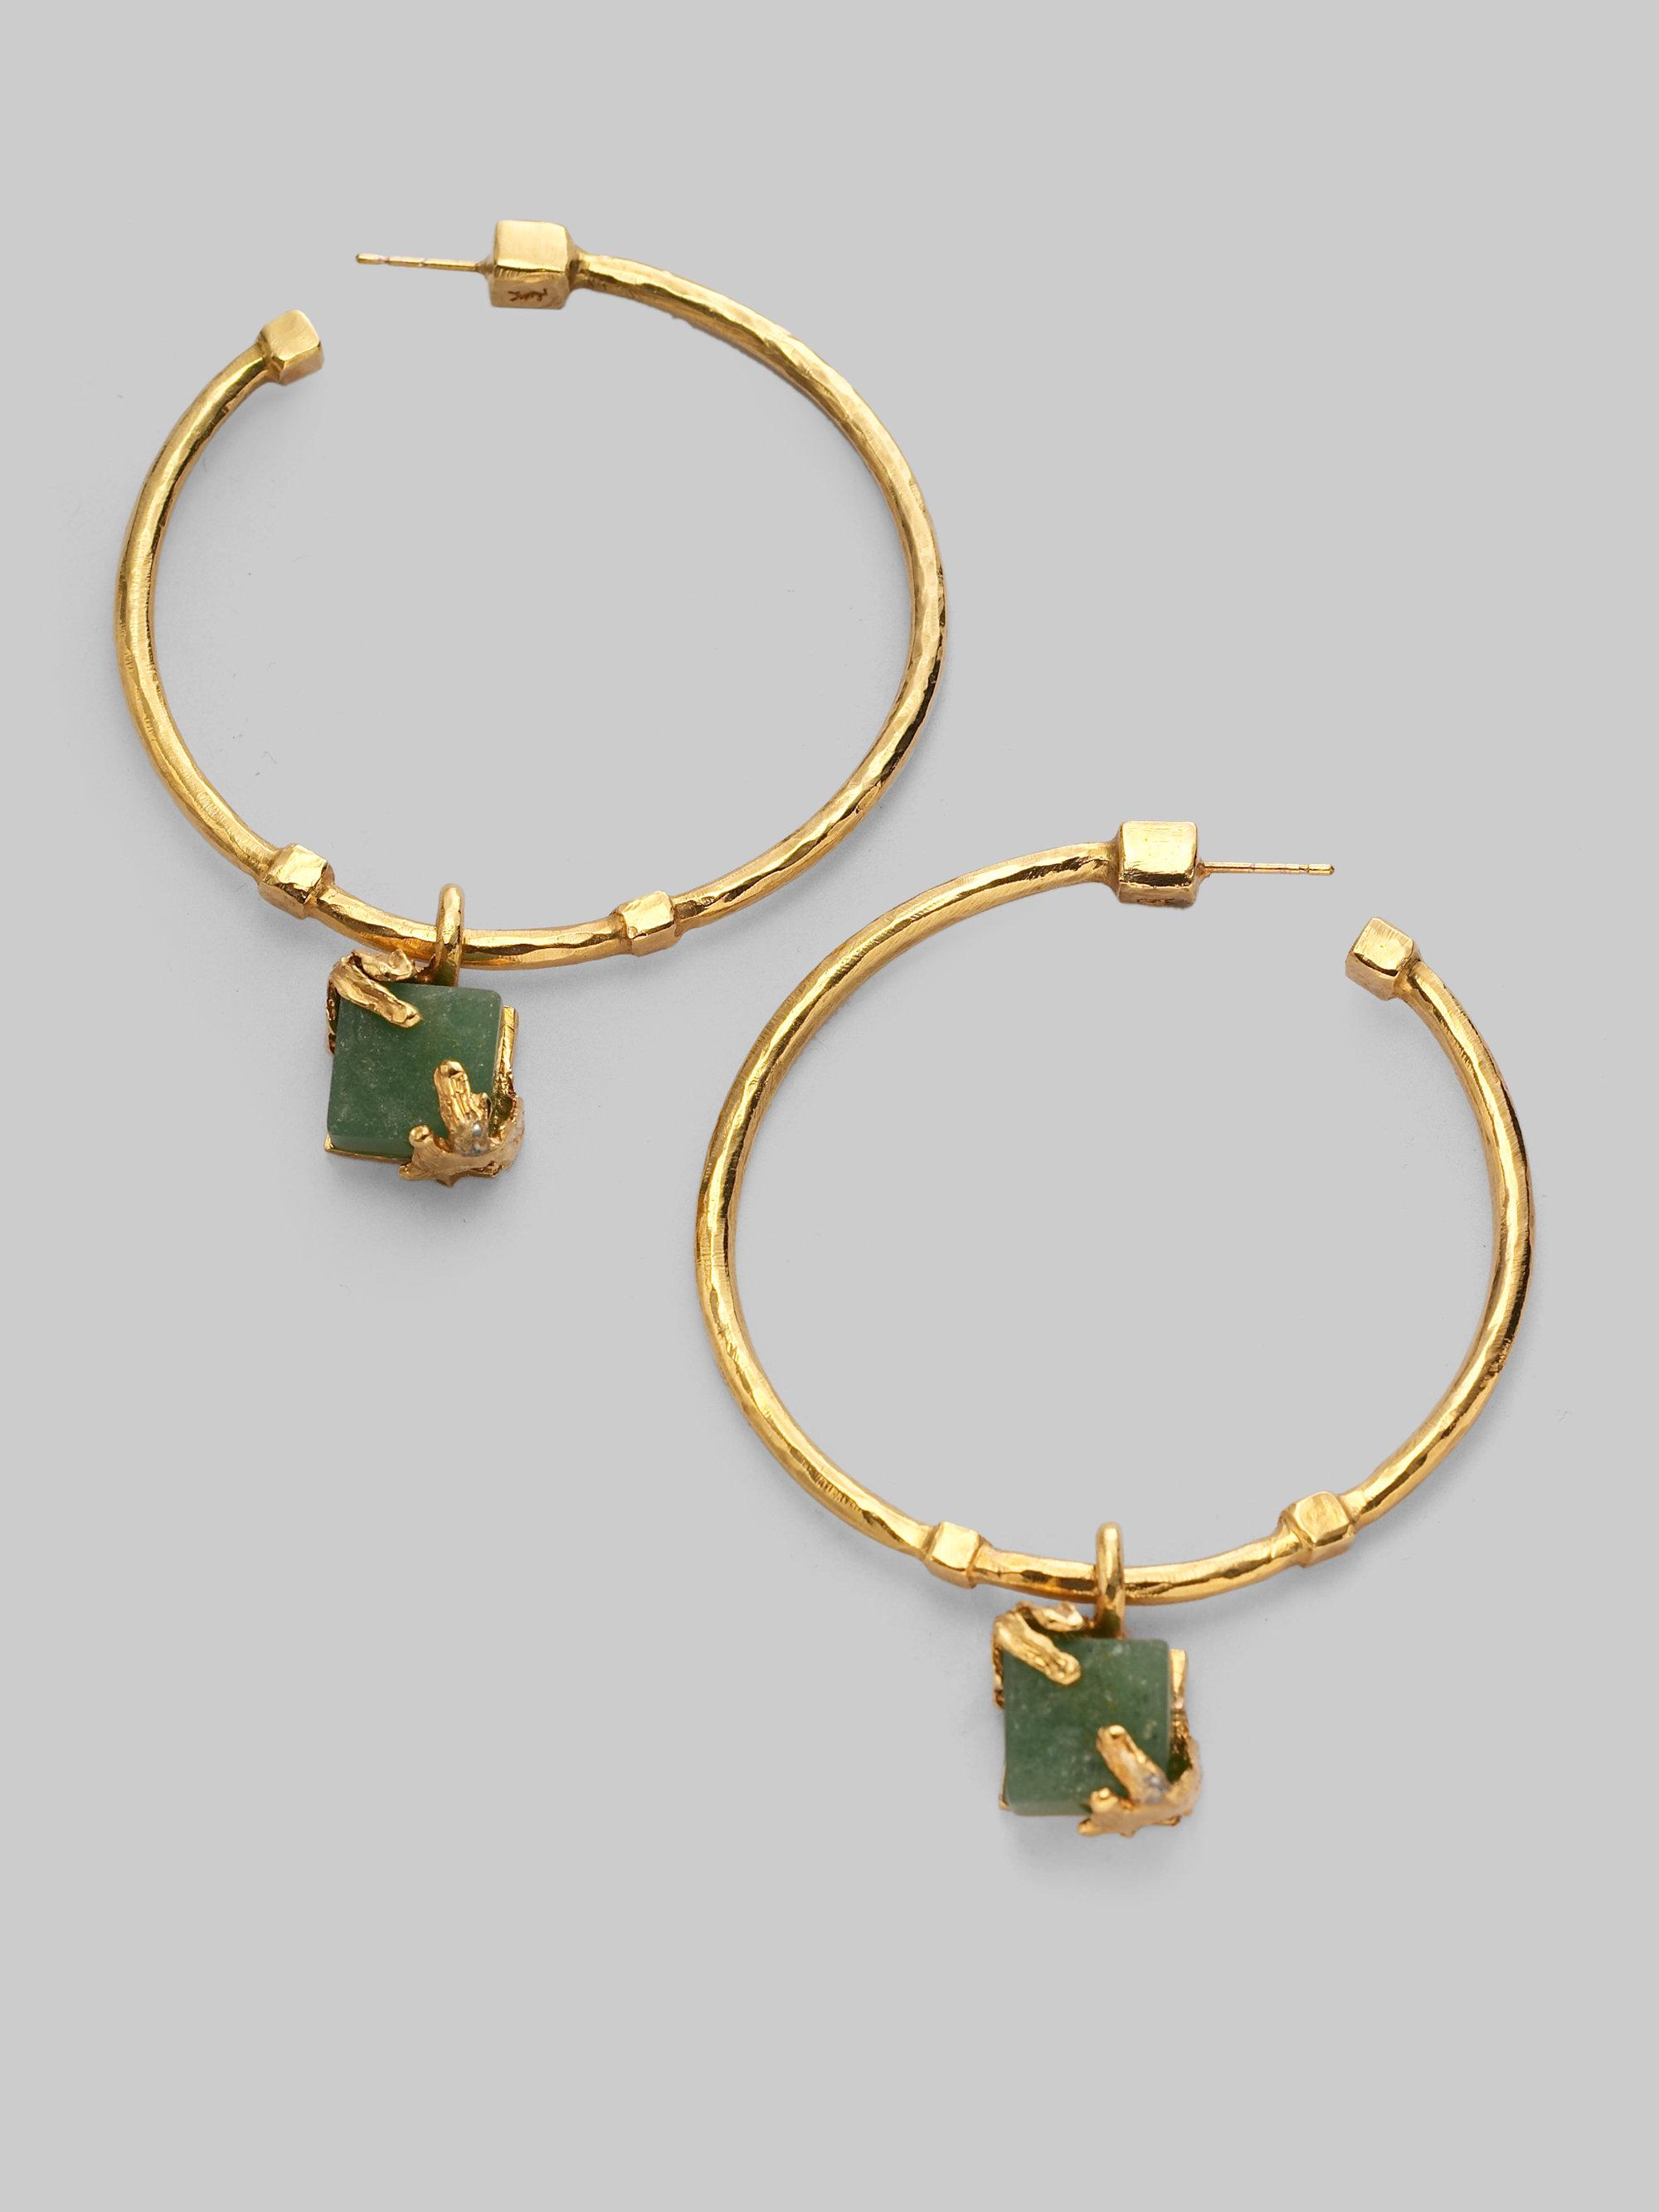 Saint Laurent Cocktail Clip Earrings in Metallics xNkz7TF